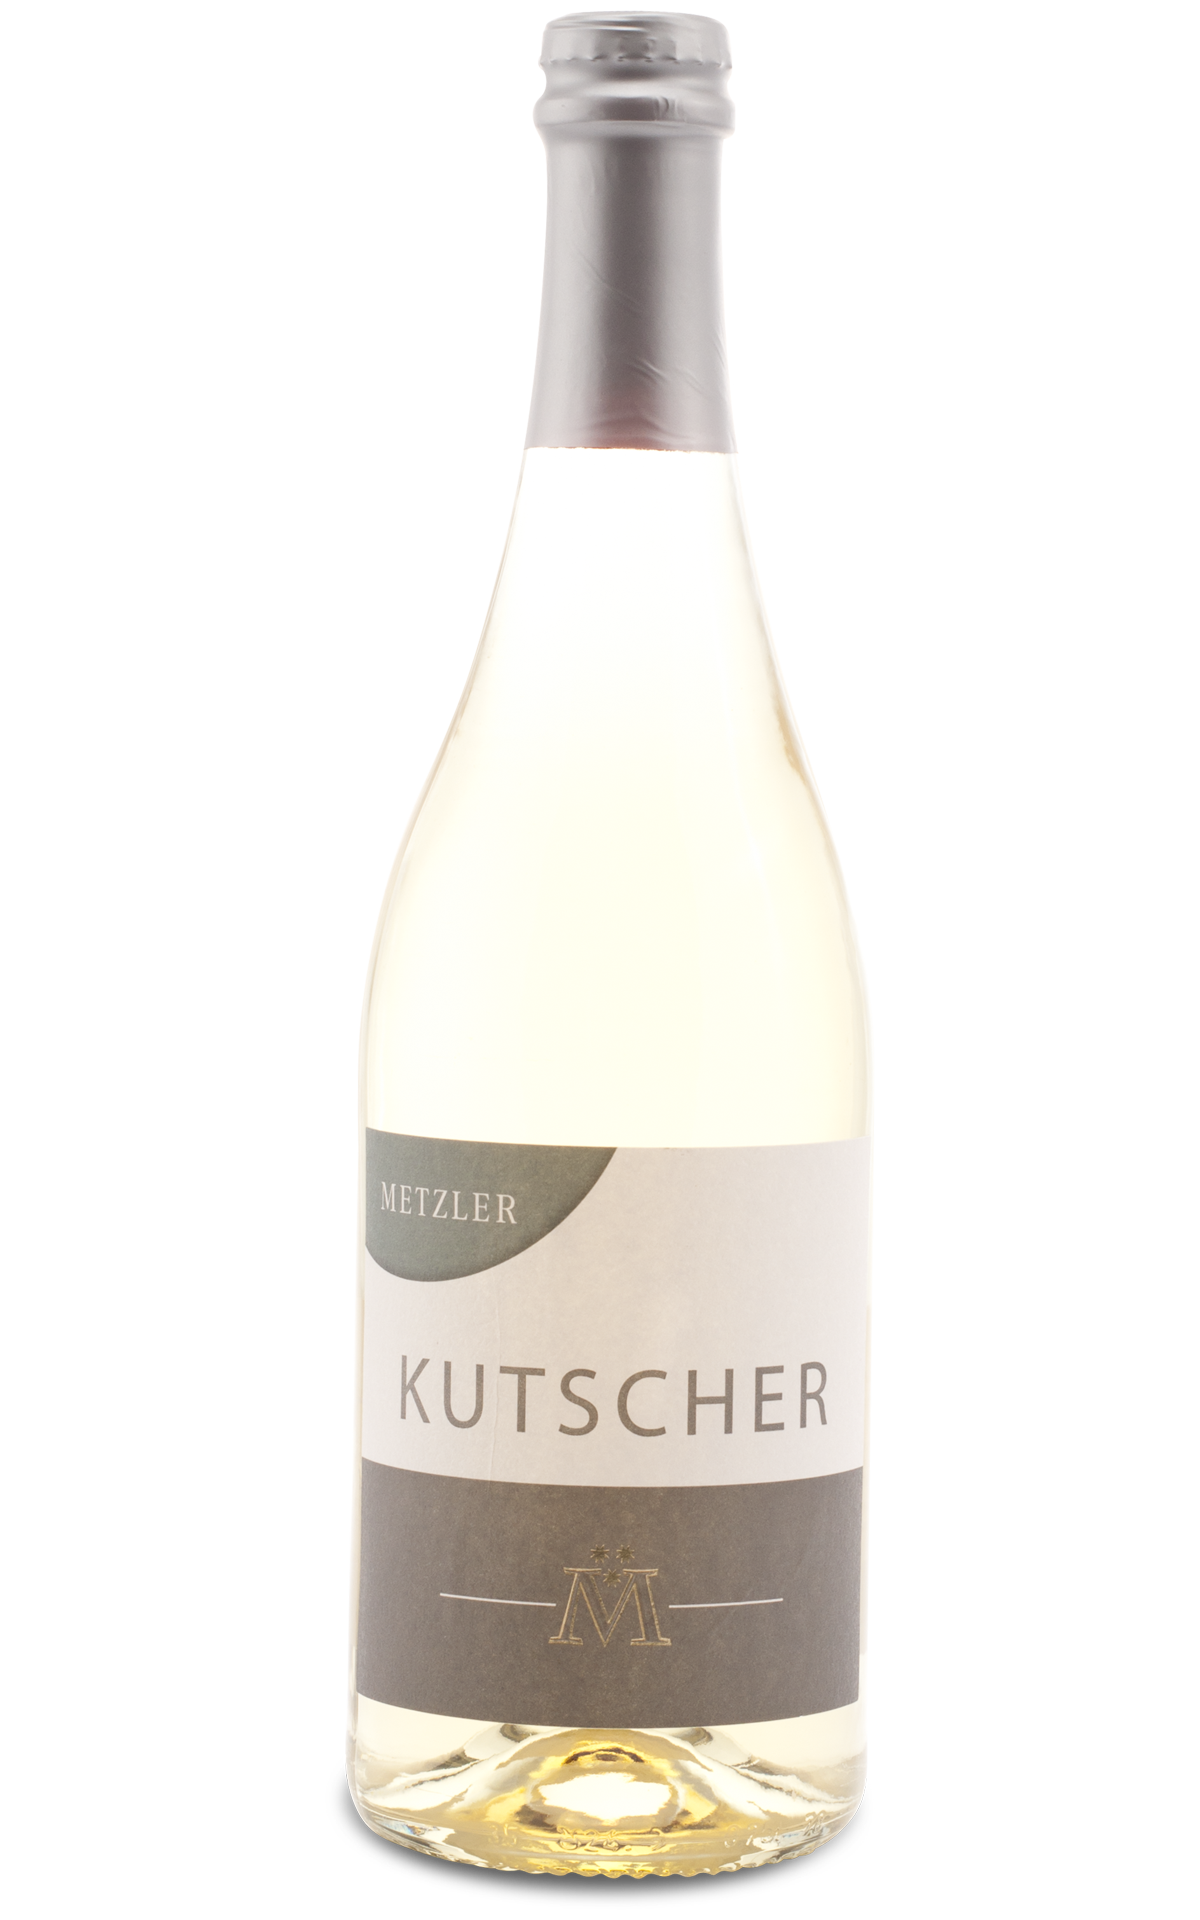 Kutscher - verperlter Traubensaft